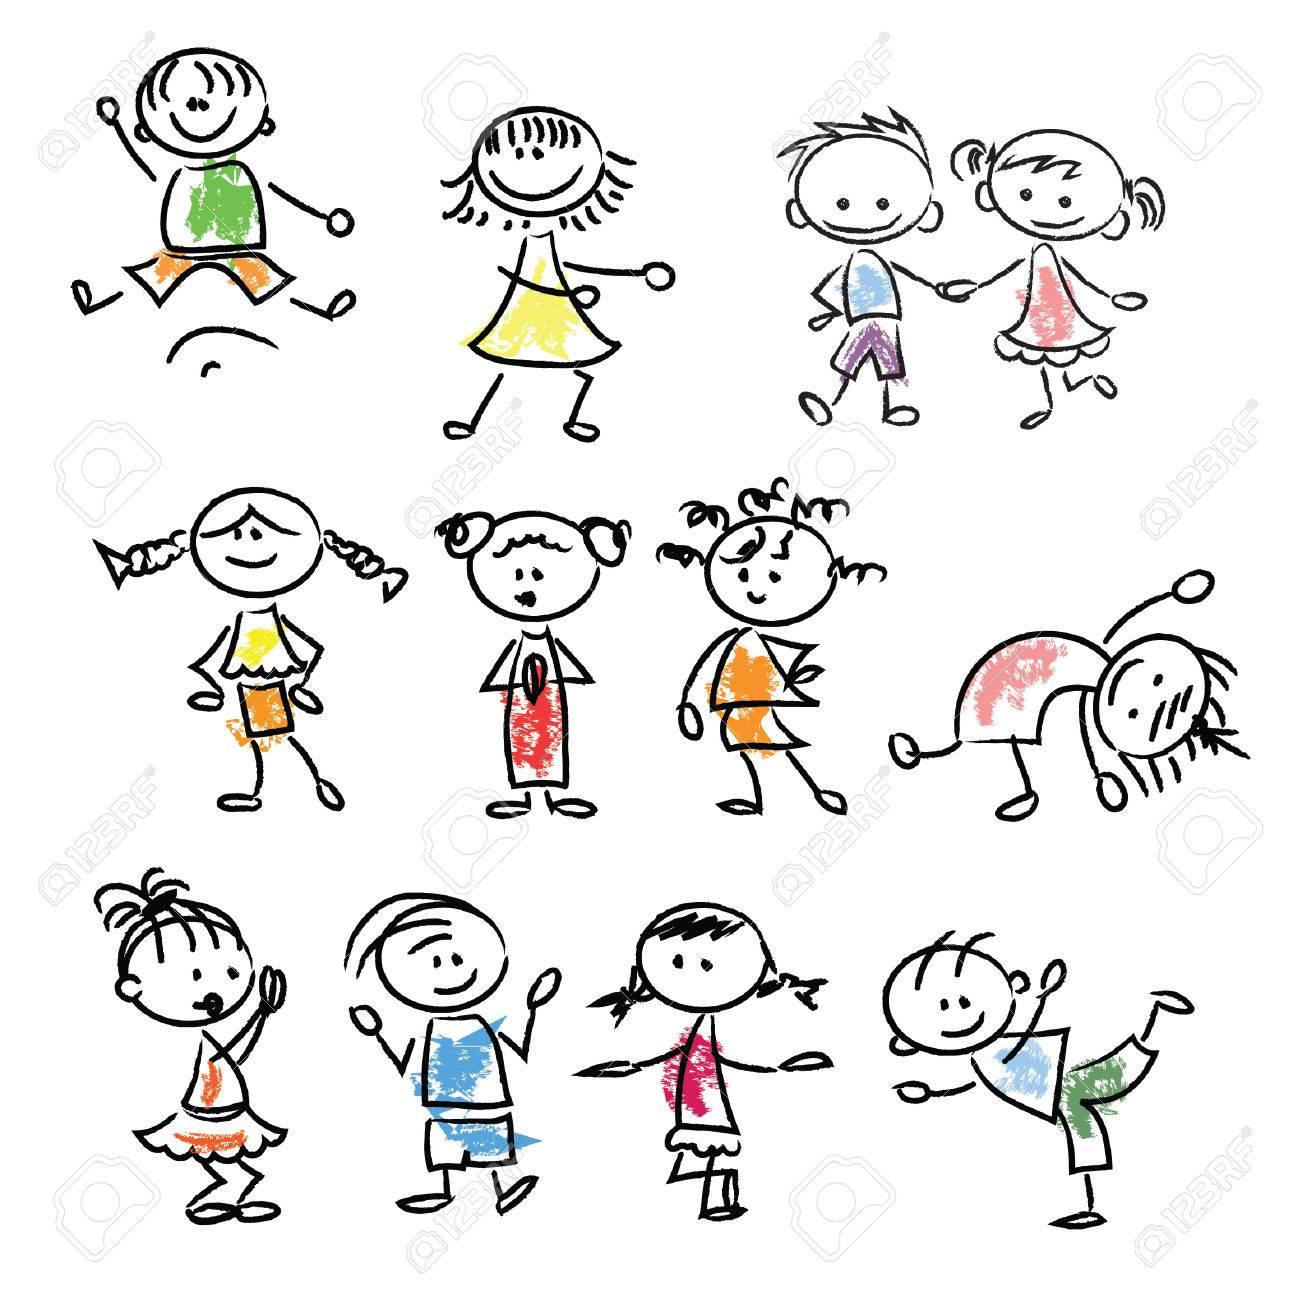 Cute happy cartoon doodle kids - 33650002